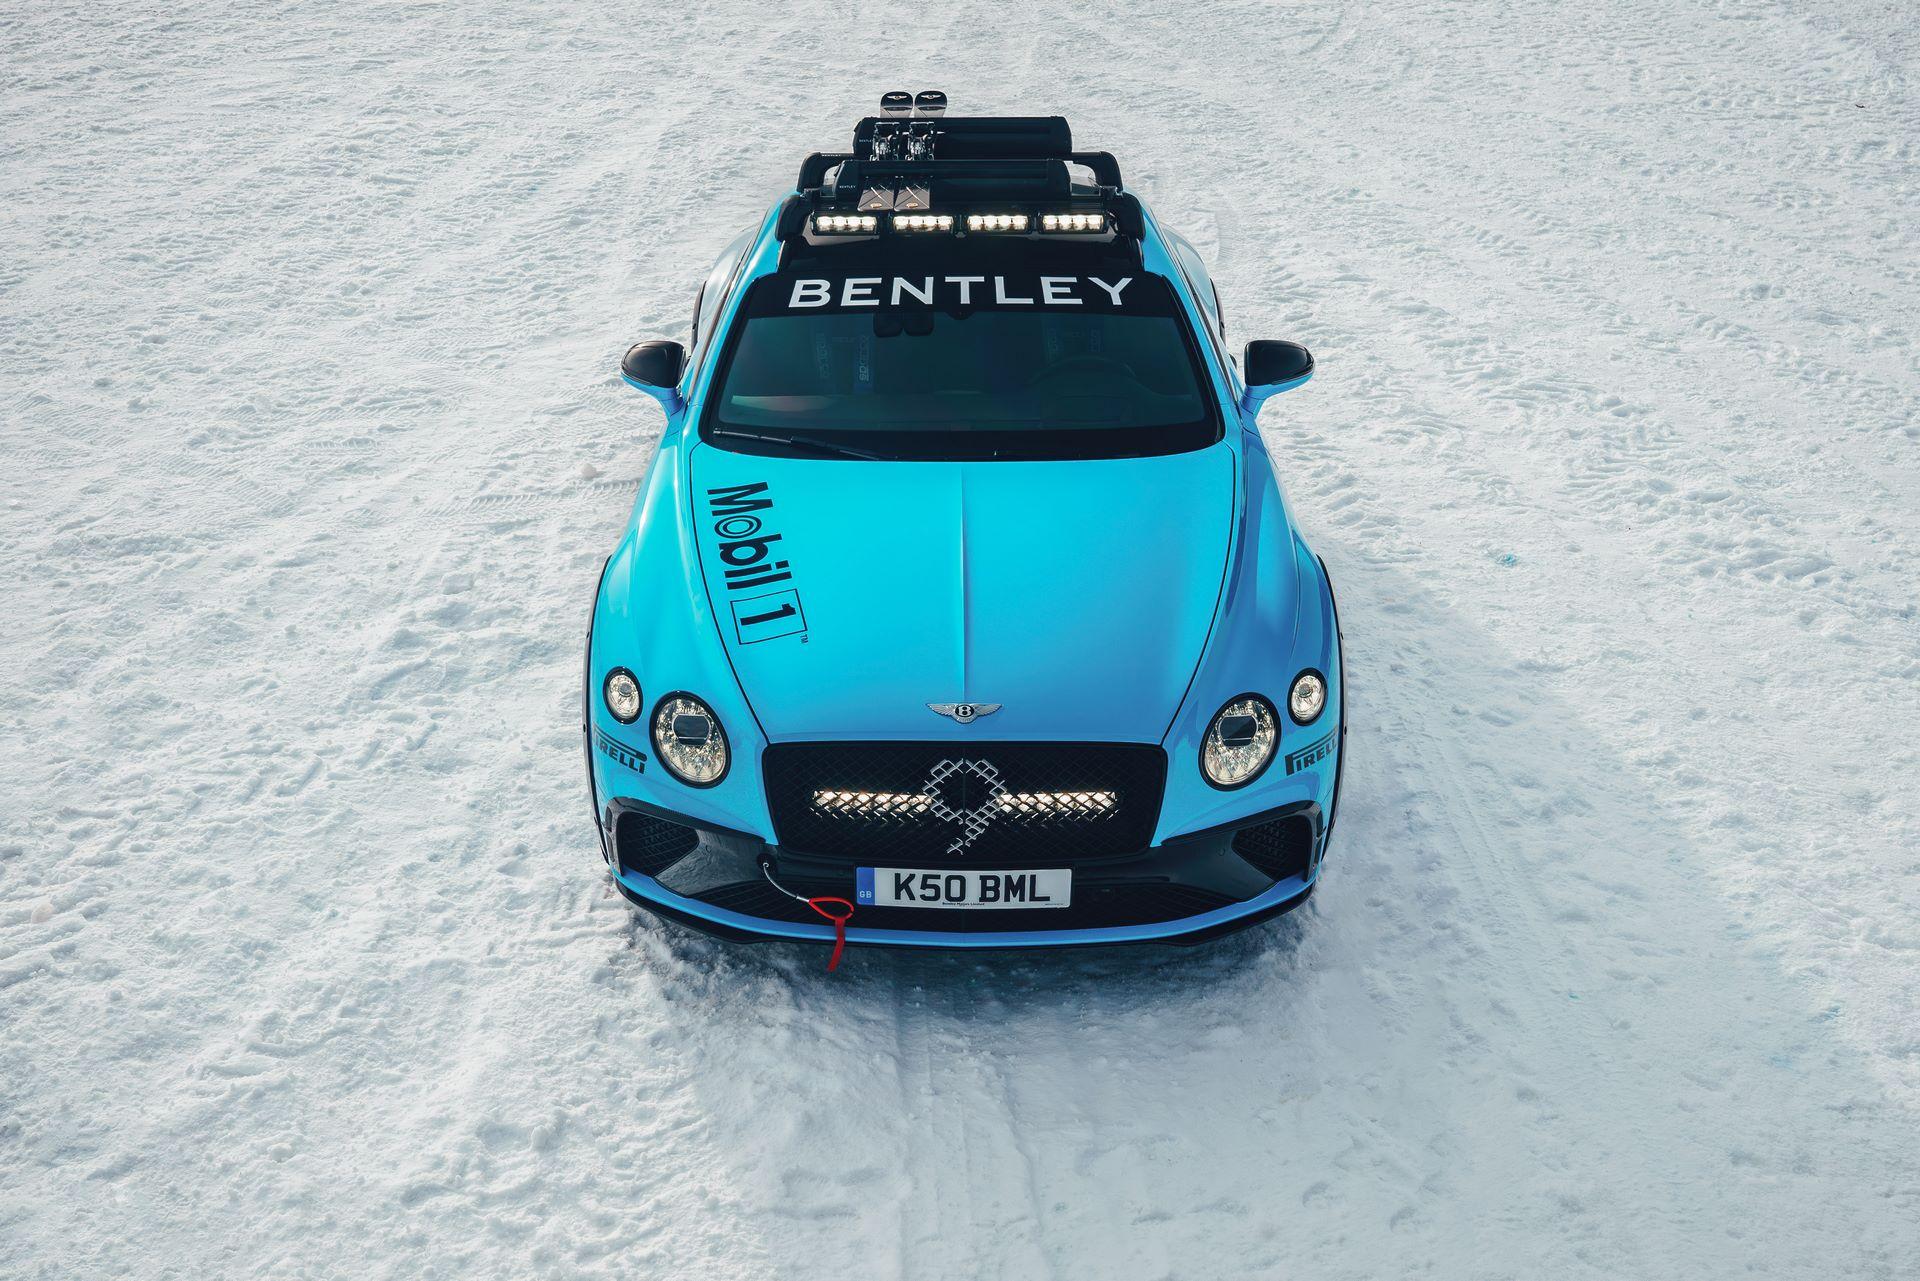 Bentley-Continental-GT-Ice-Race-2020-5